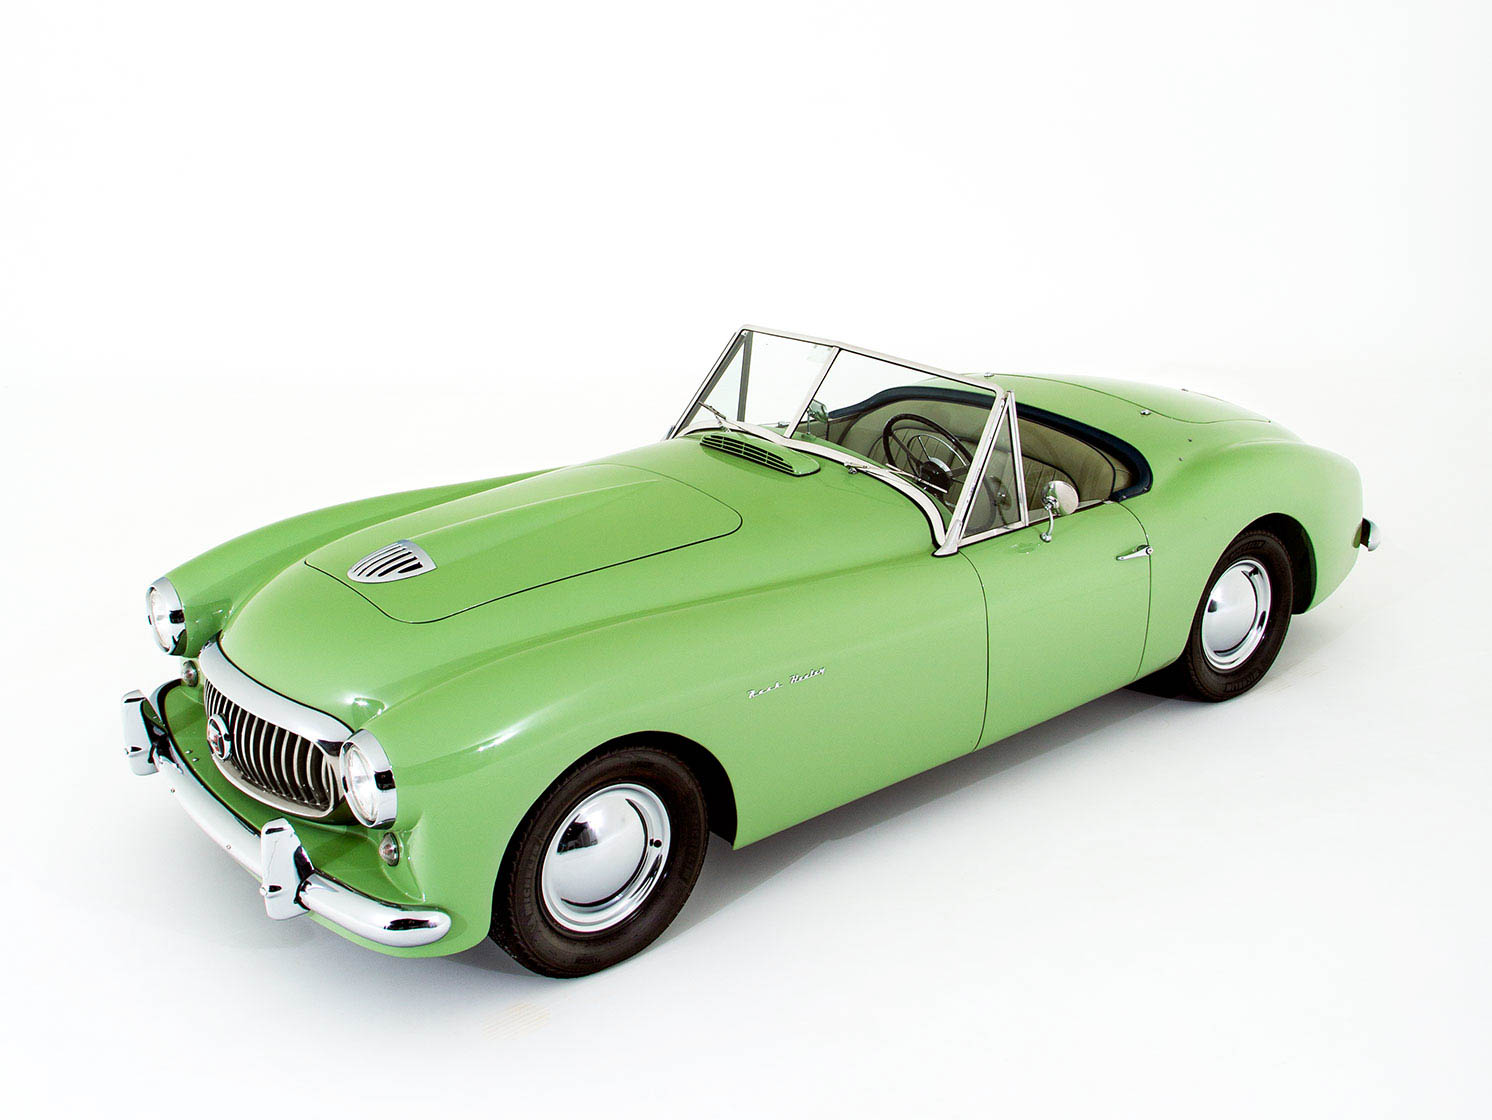 1951 Nash-Healey